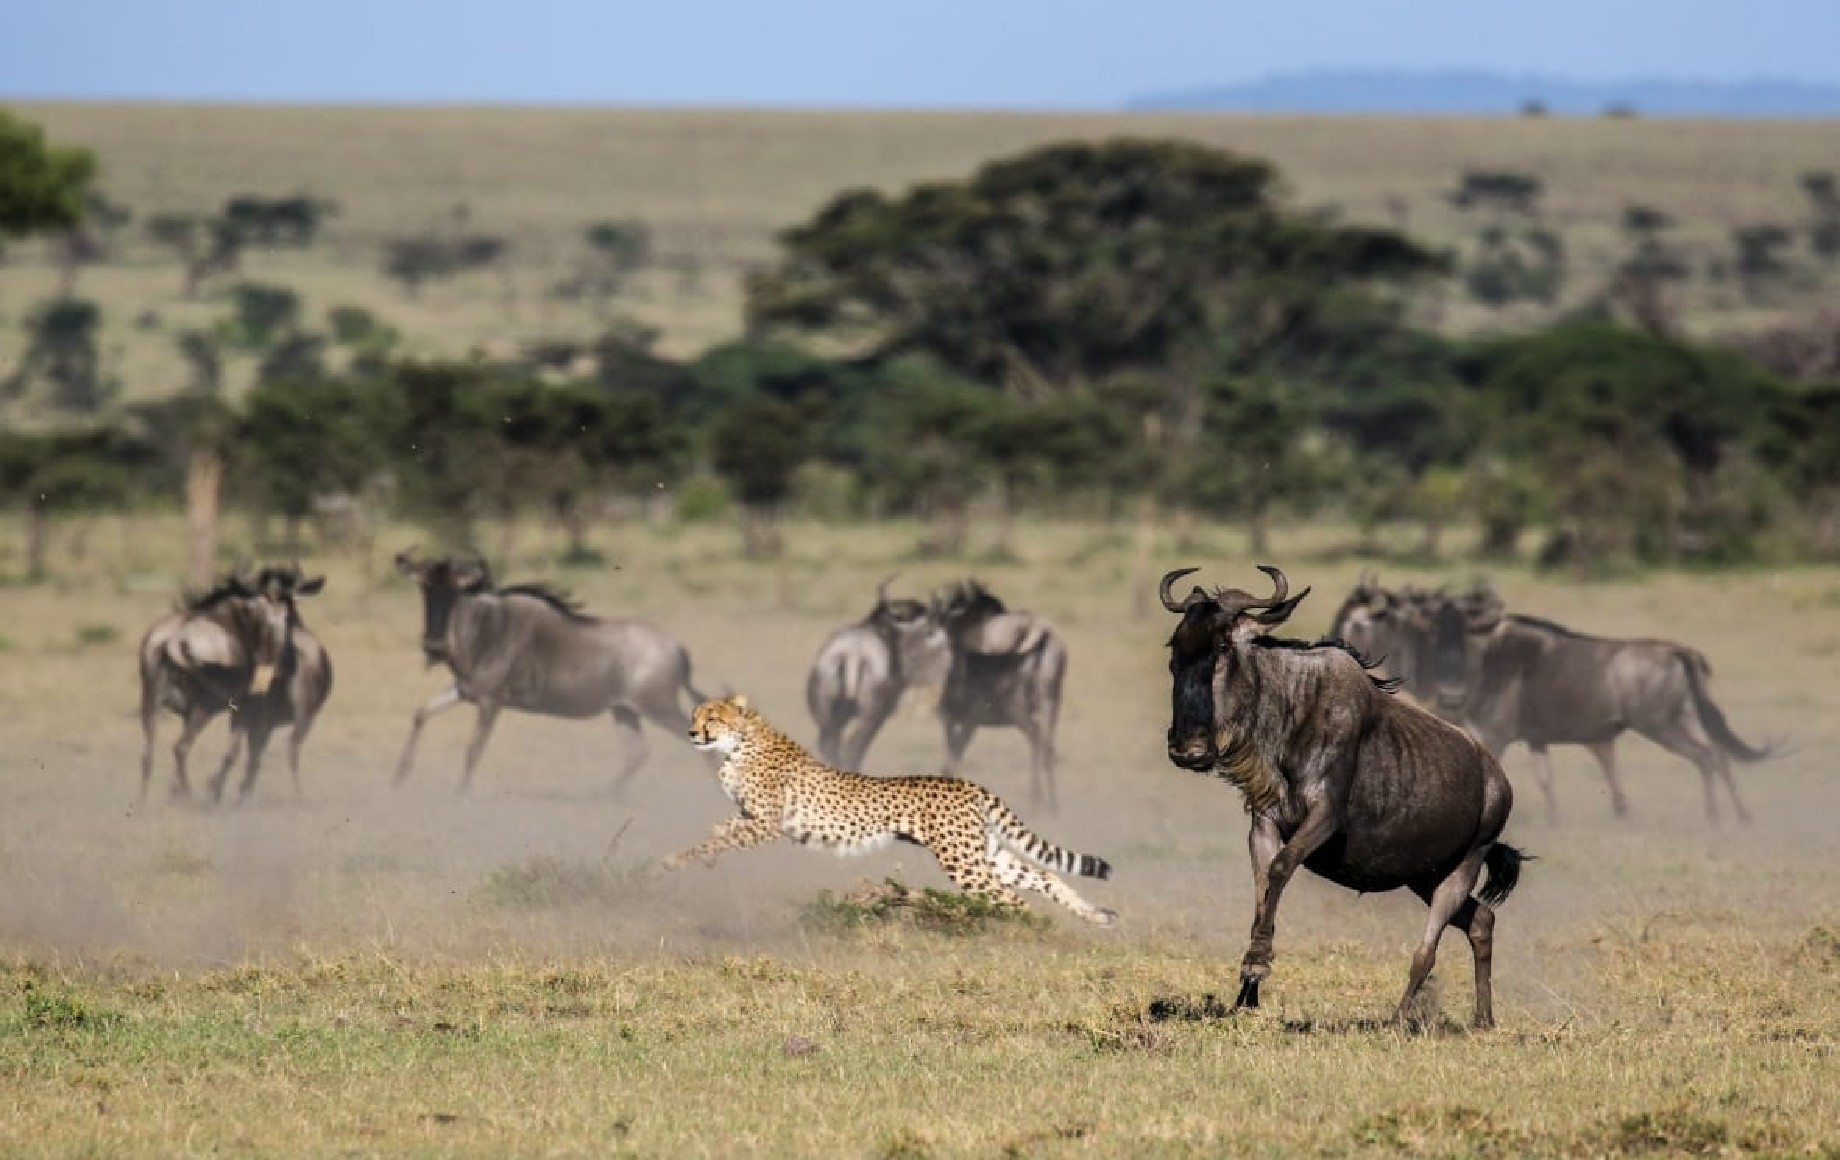 A cheetah chasing buffalo